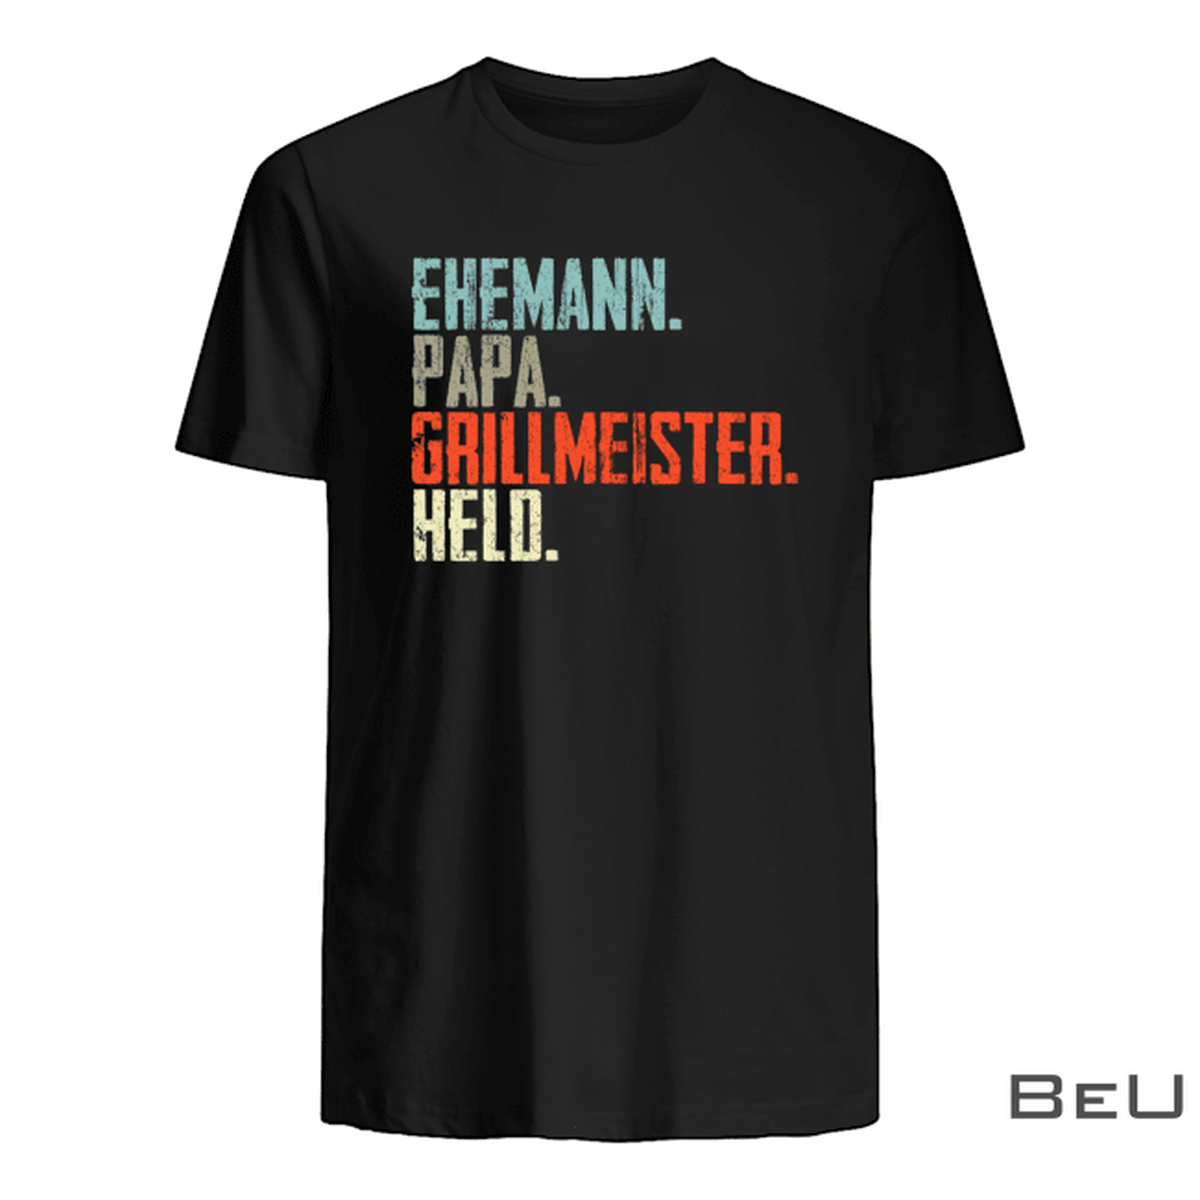 Ehemann Papa Grillmeister Held Shirt